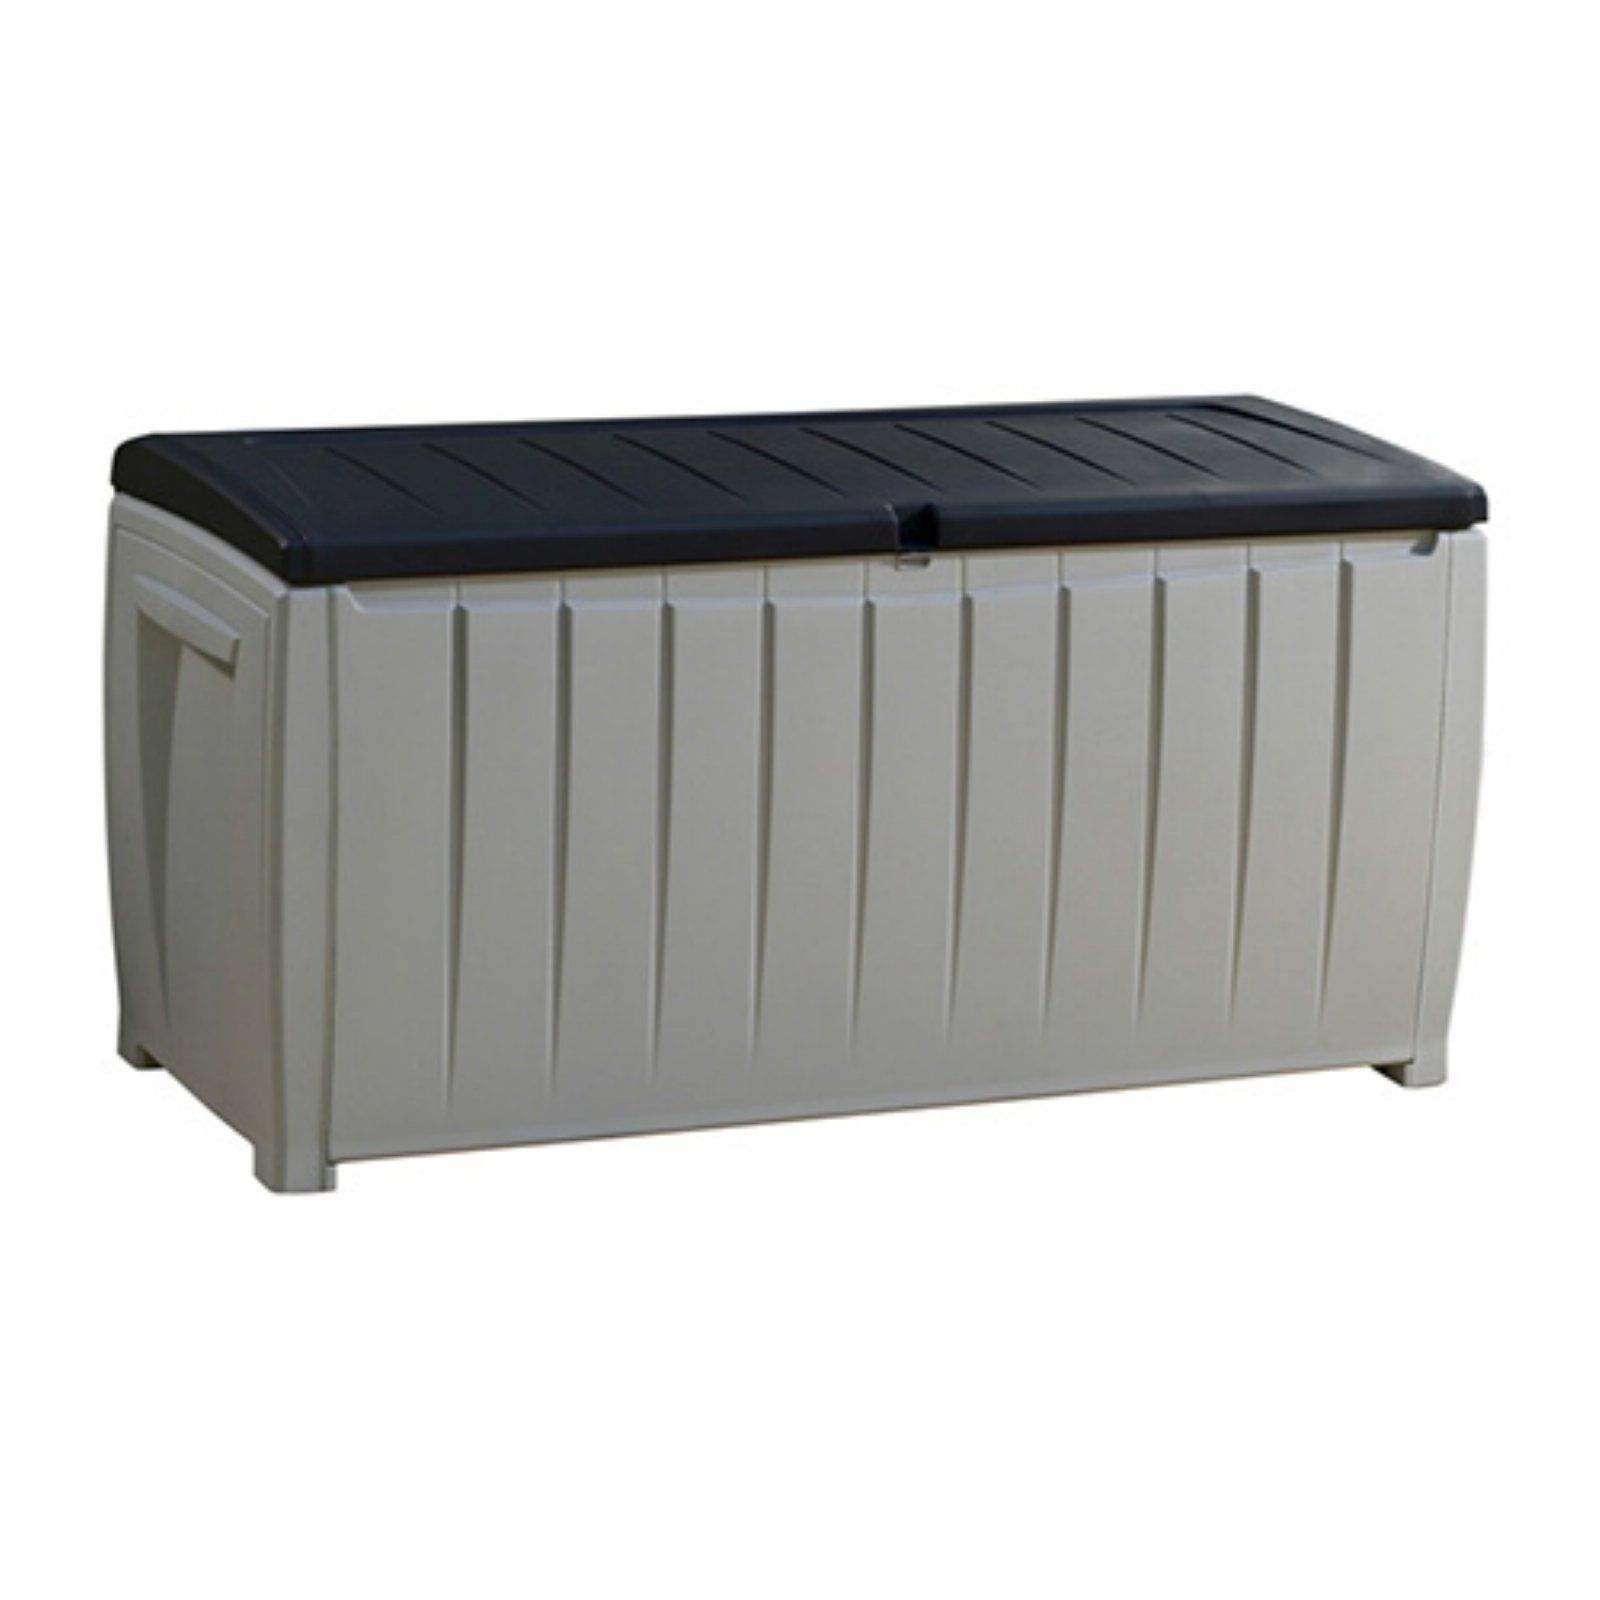 Keter Novel 90 Gallon Deck Box Patio Storage Deck Box Storage